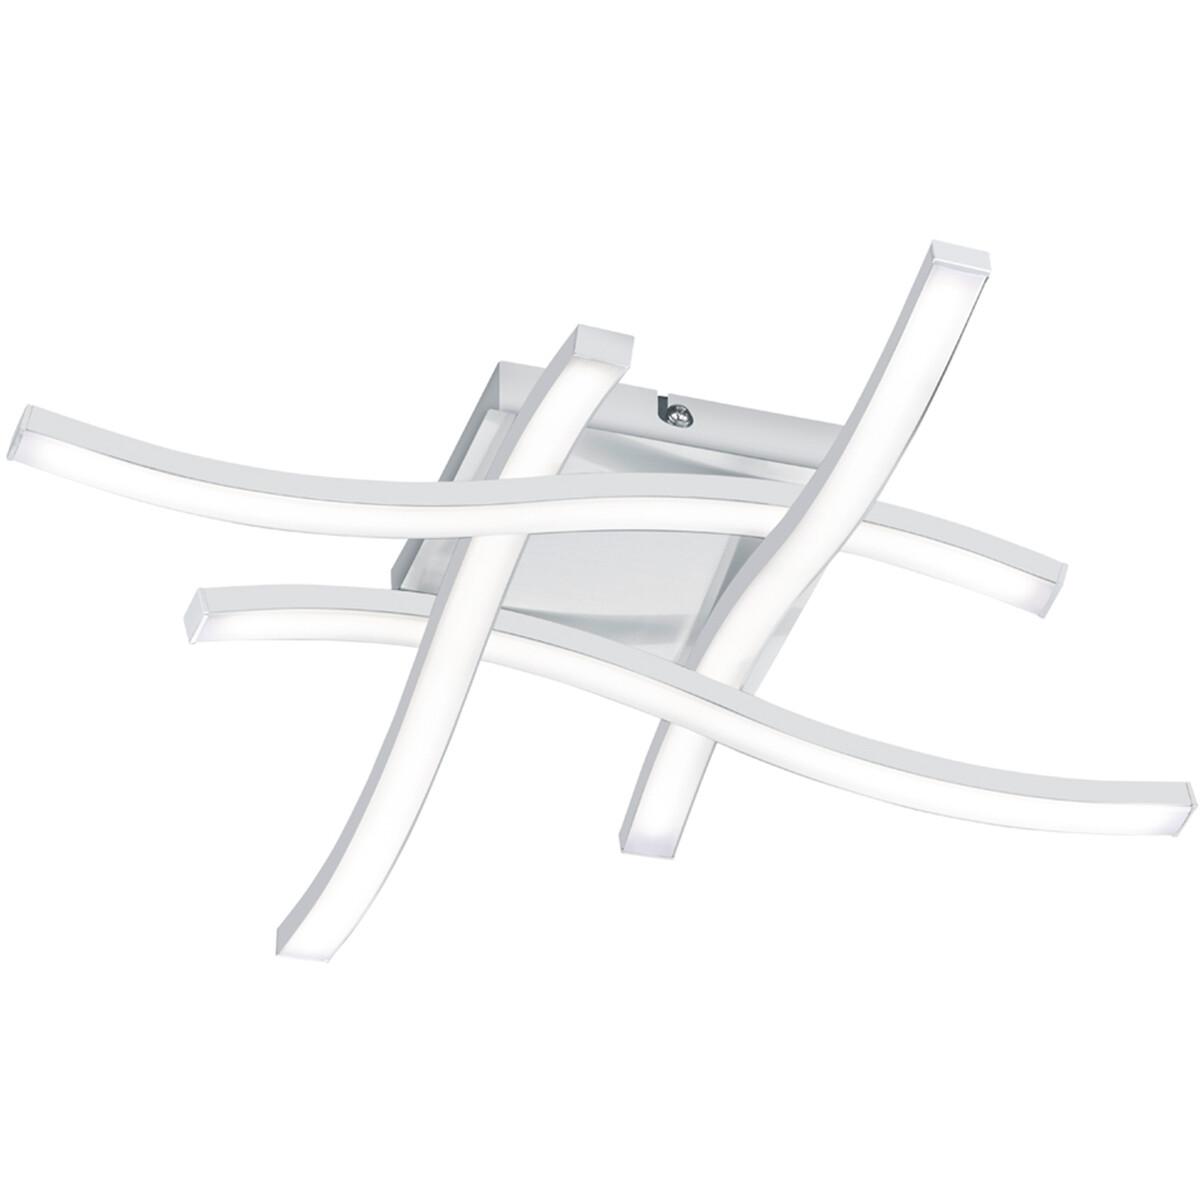 LED Plafondlamp - Plafondverlichting - Trion Ritonu - 20W - Natuurlijk Wit 4000K - Vierkant - Mat Wi